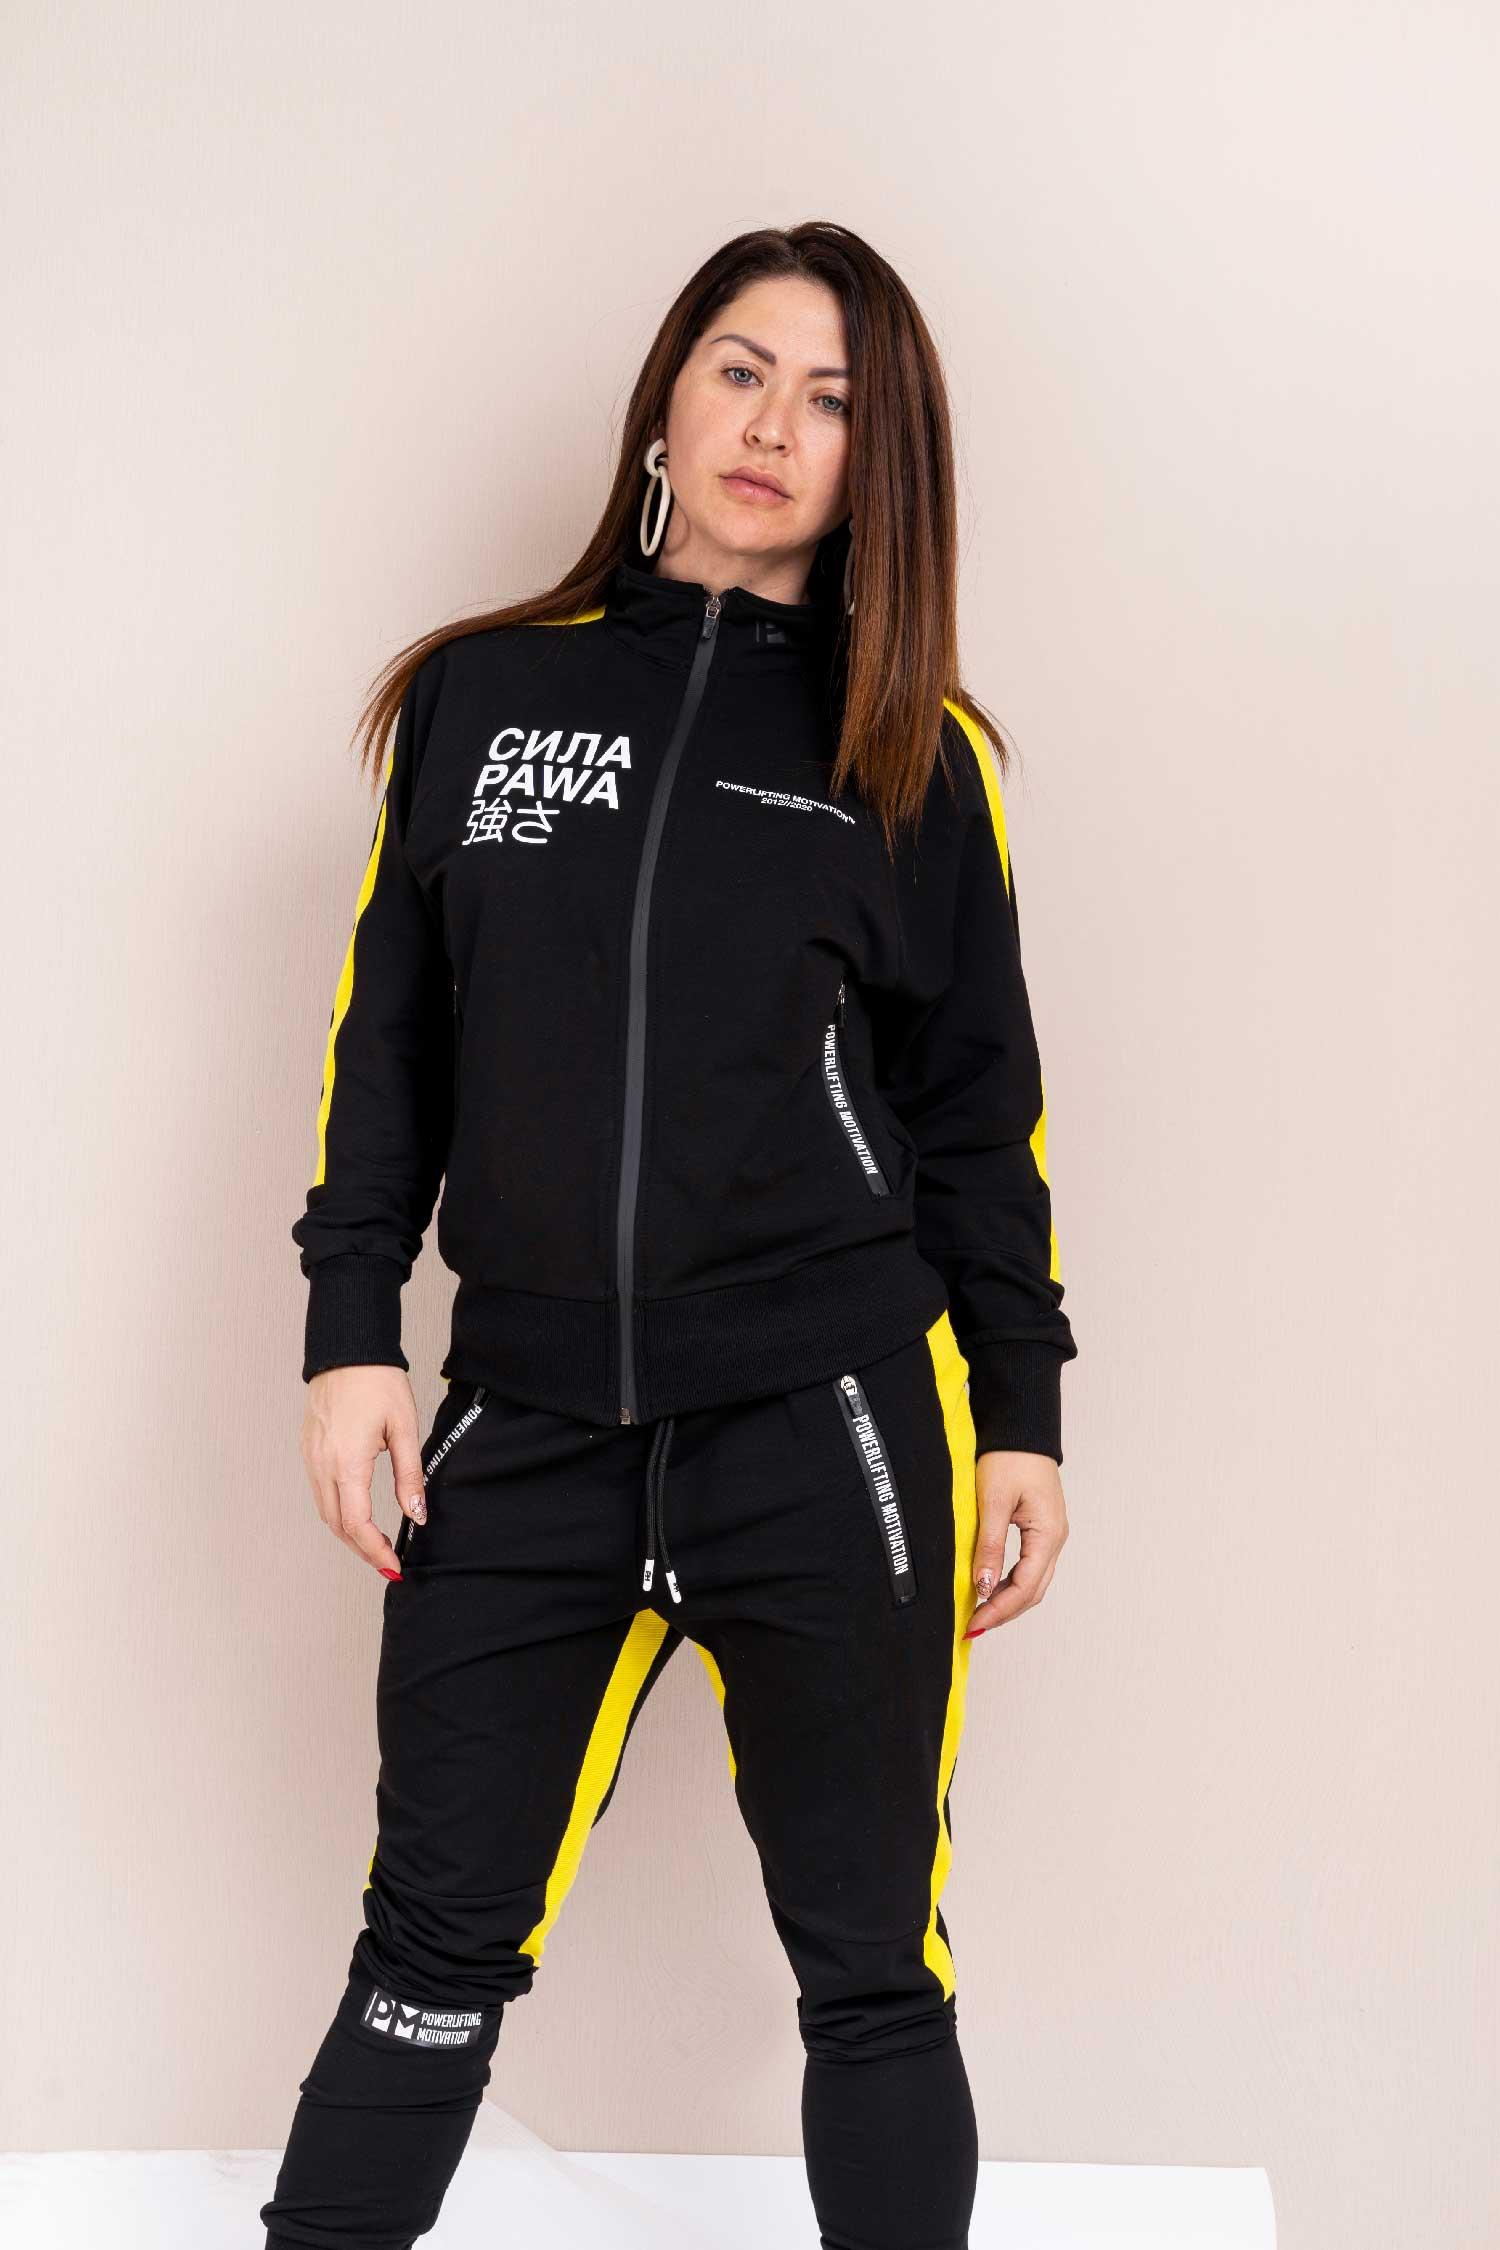 pm-black-yellow-full-body-jana